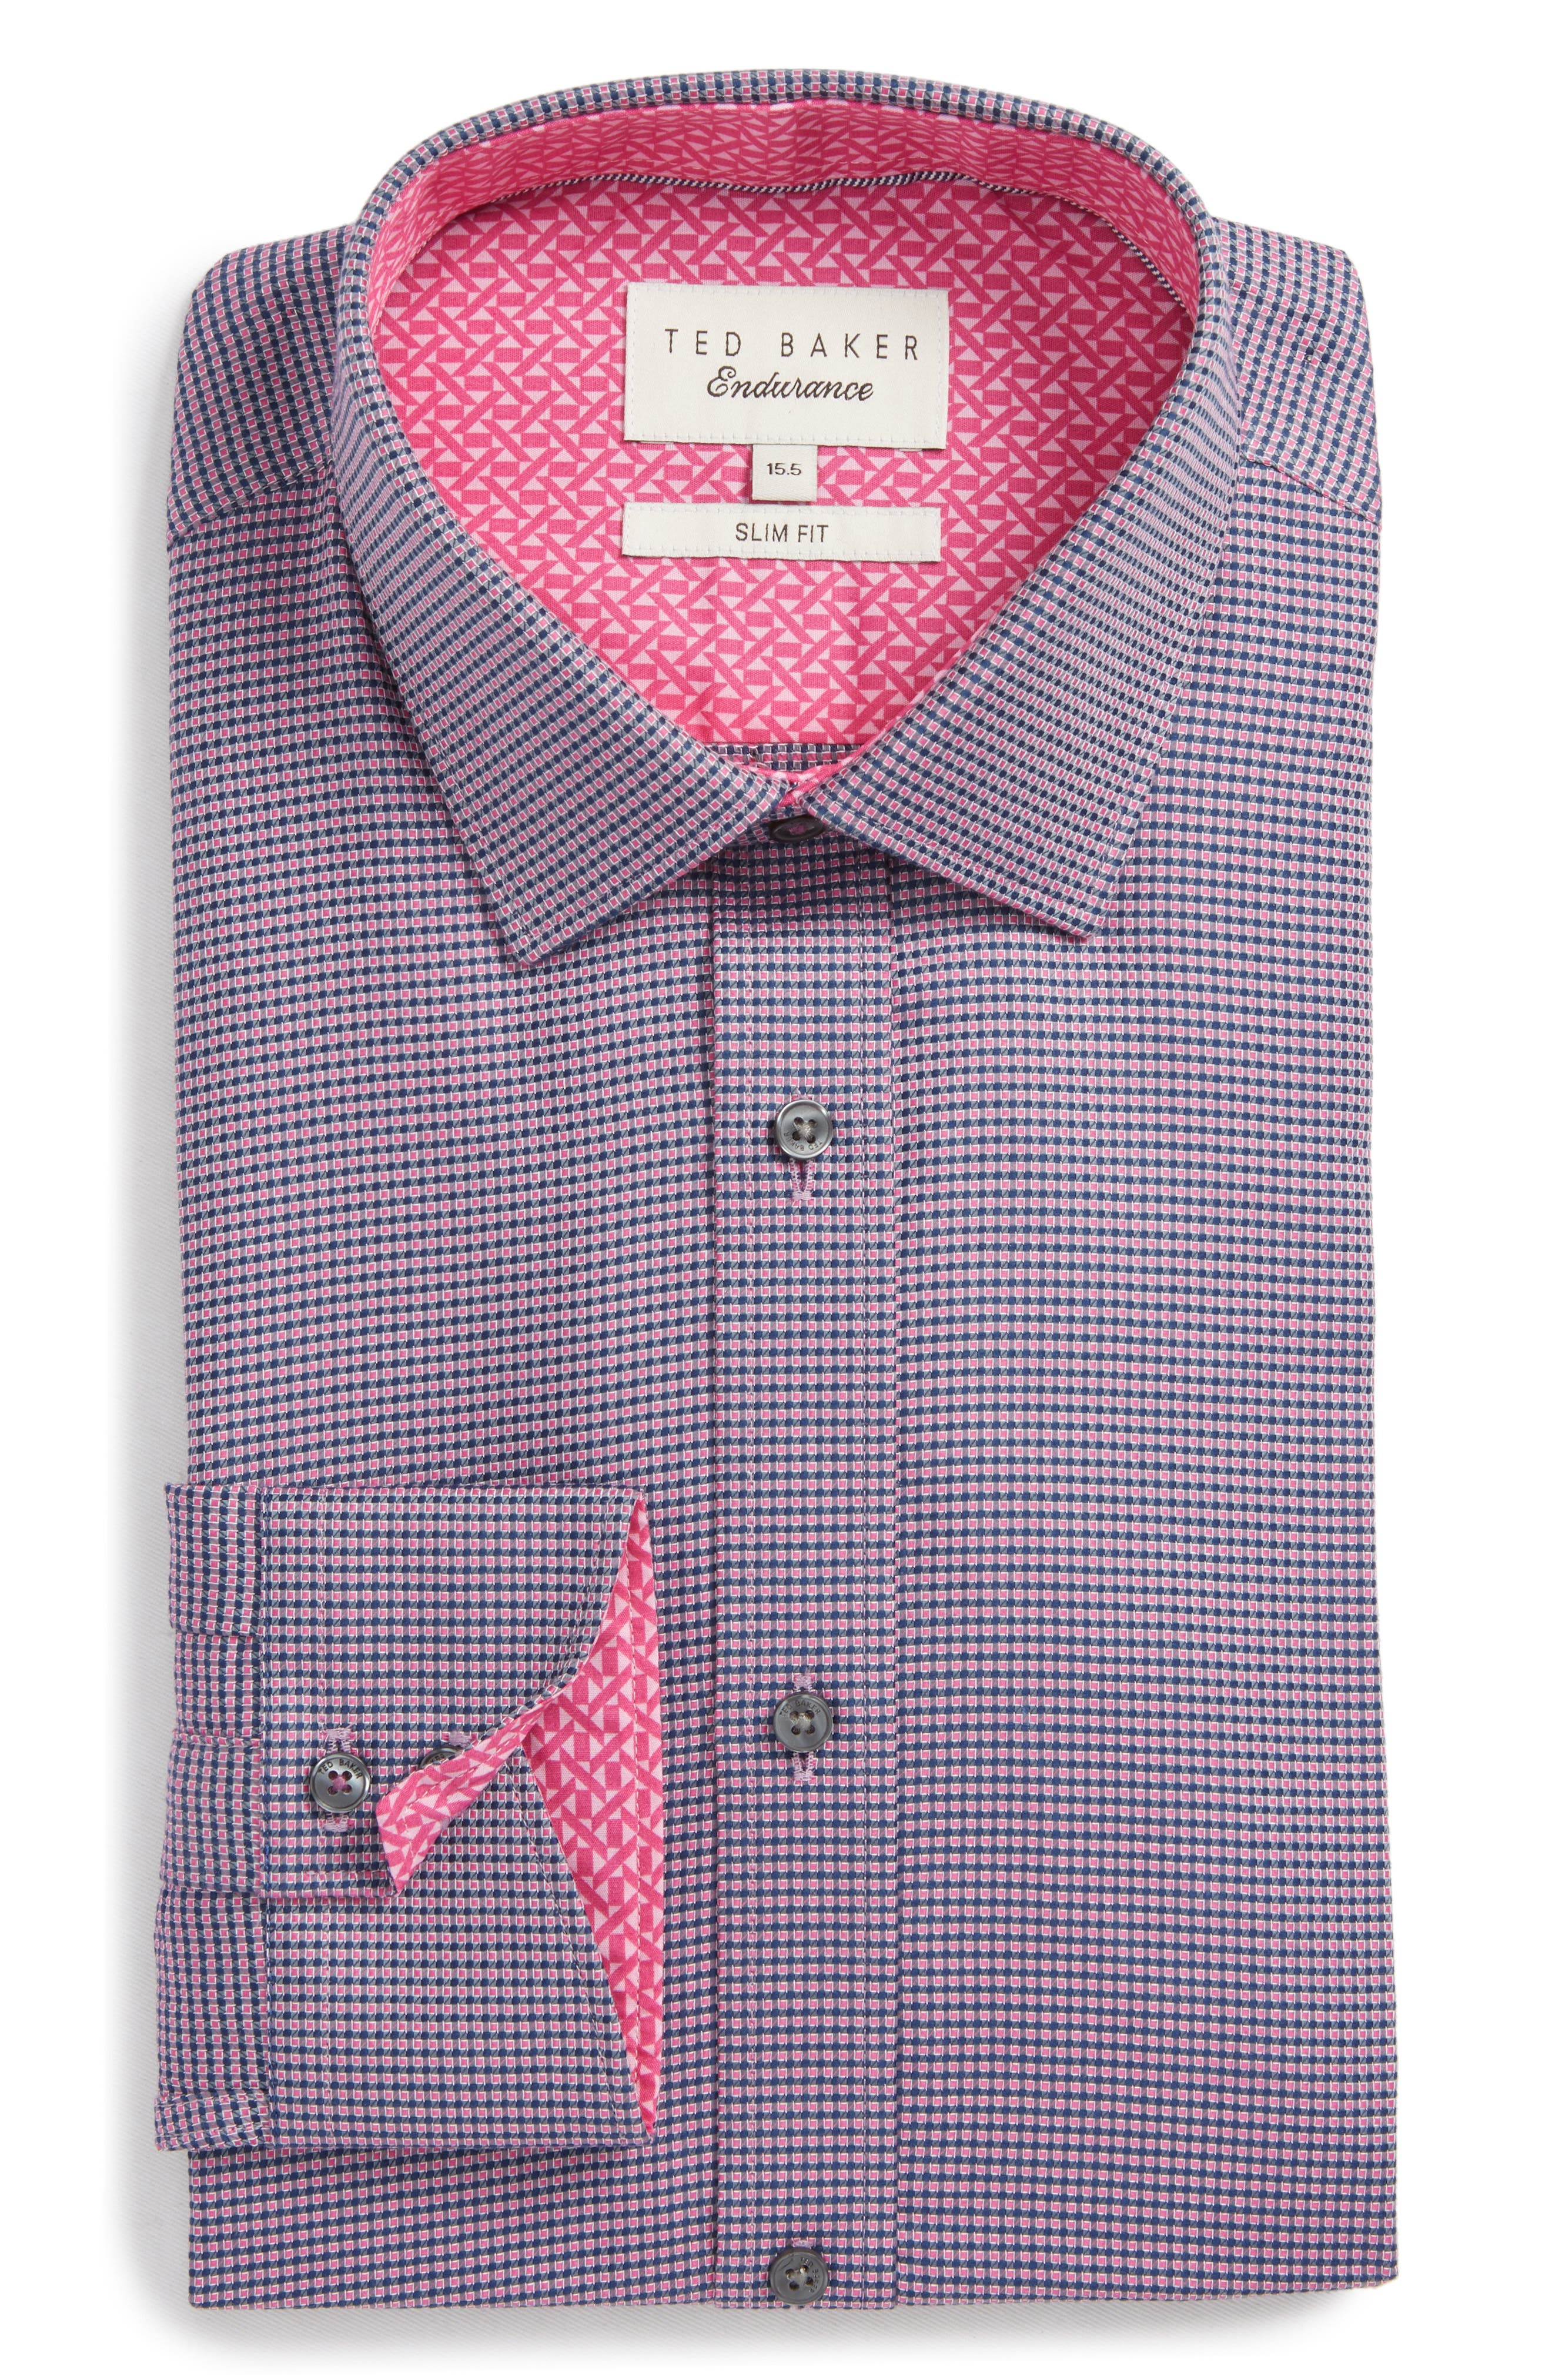 Endurance Slim Fit Box Twill Dress Shirt,                             Main thumbnail 1, color,                             PINK